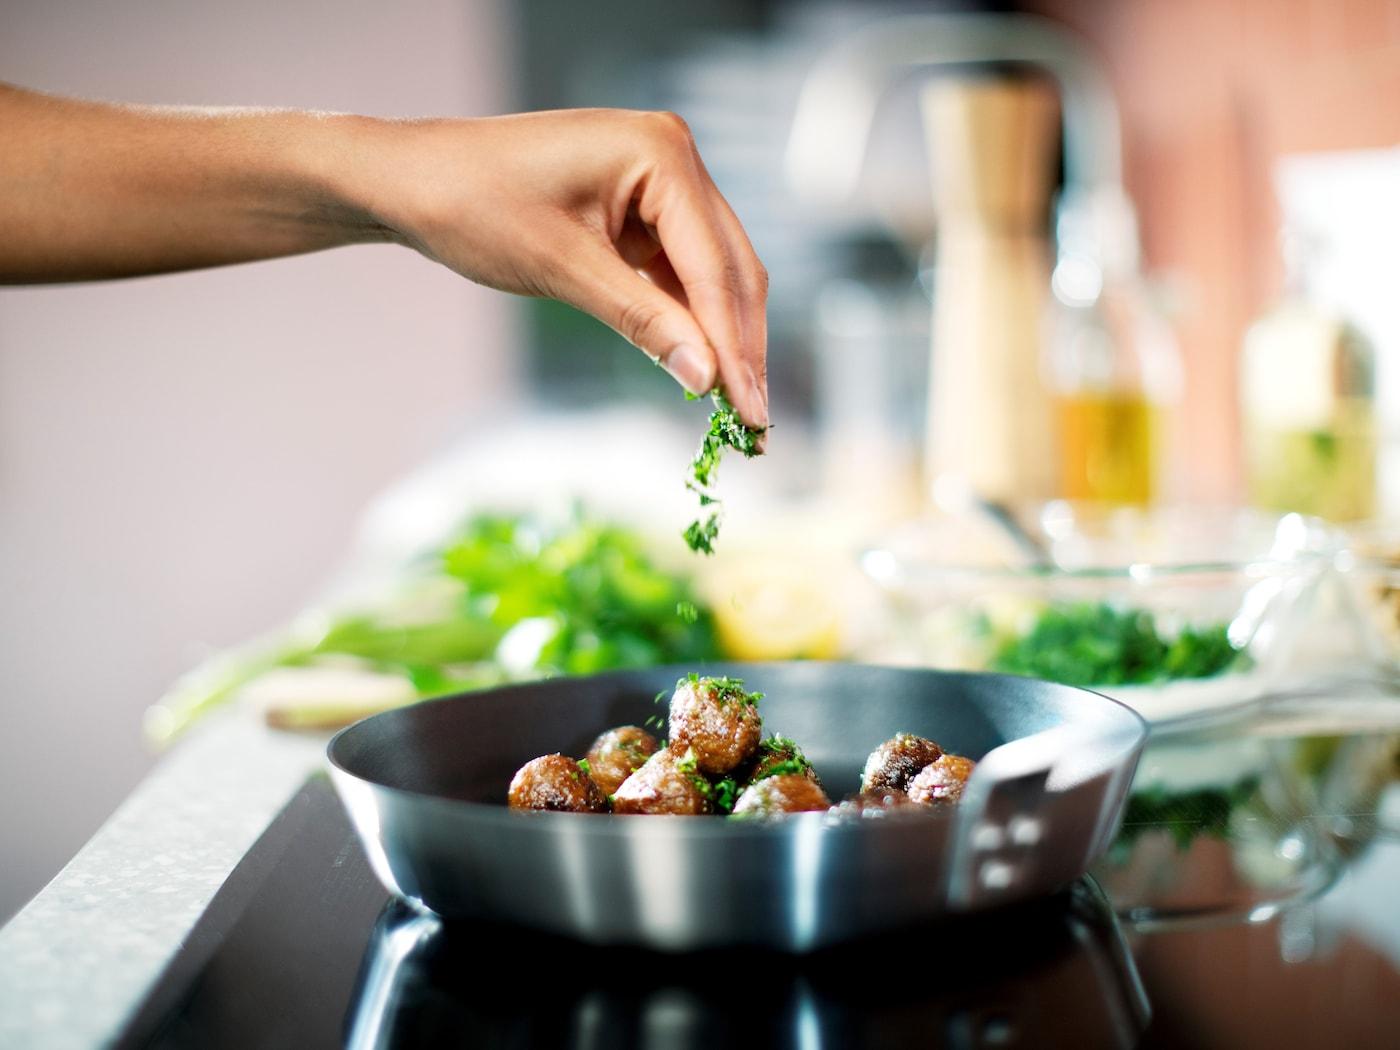 Mão a temperar almôndegas de proteína vegetal HUVUDROLL numa frigideira IKEA 365+.